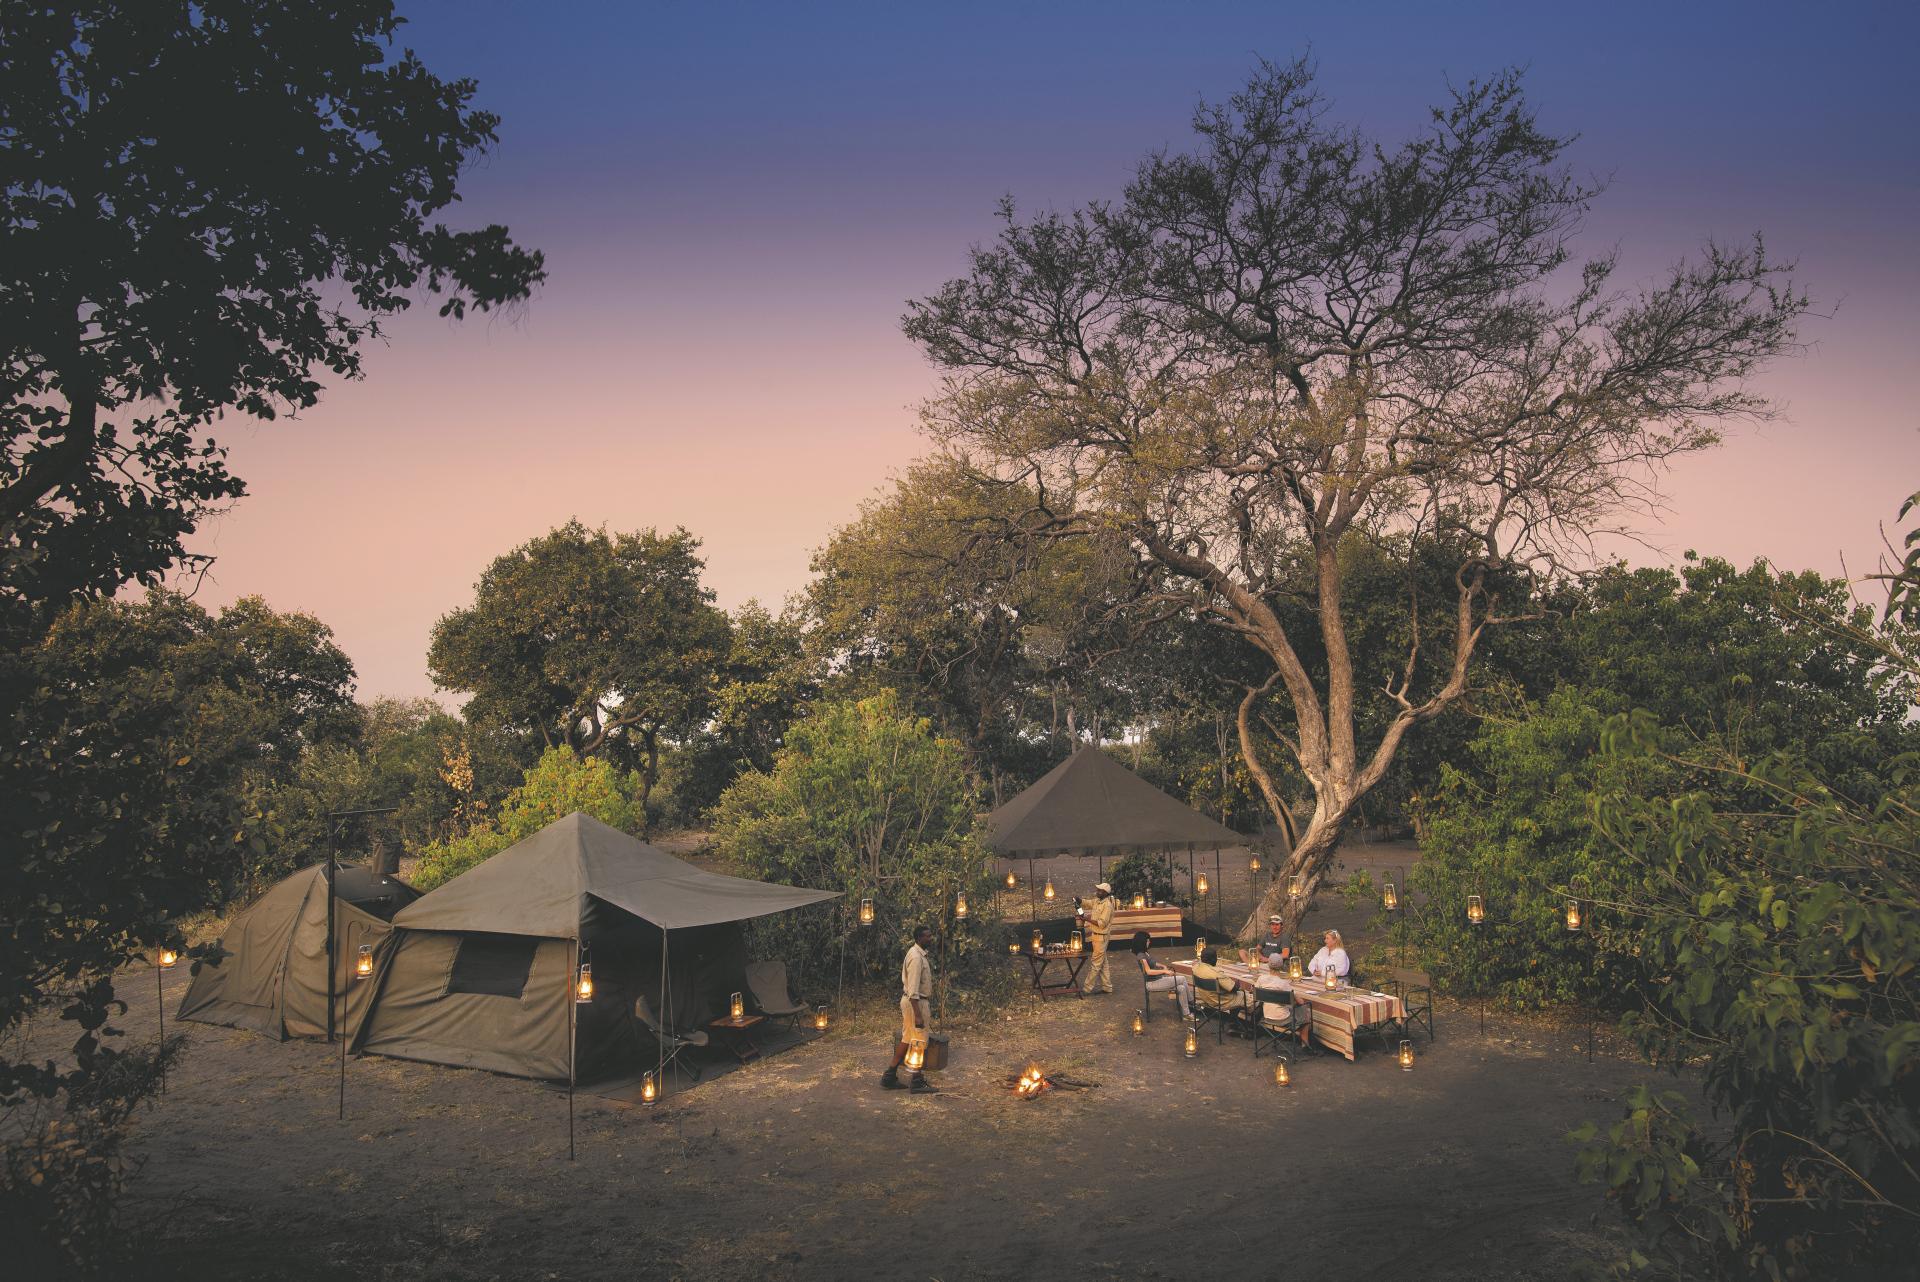 andBeyond Botswana Classic Explorer